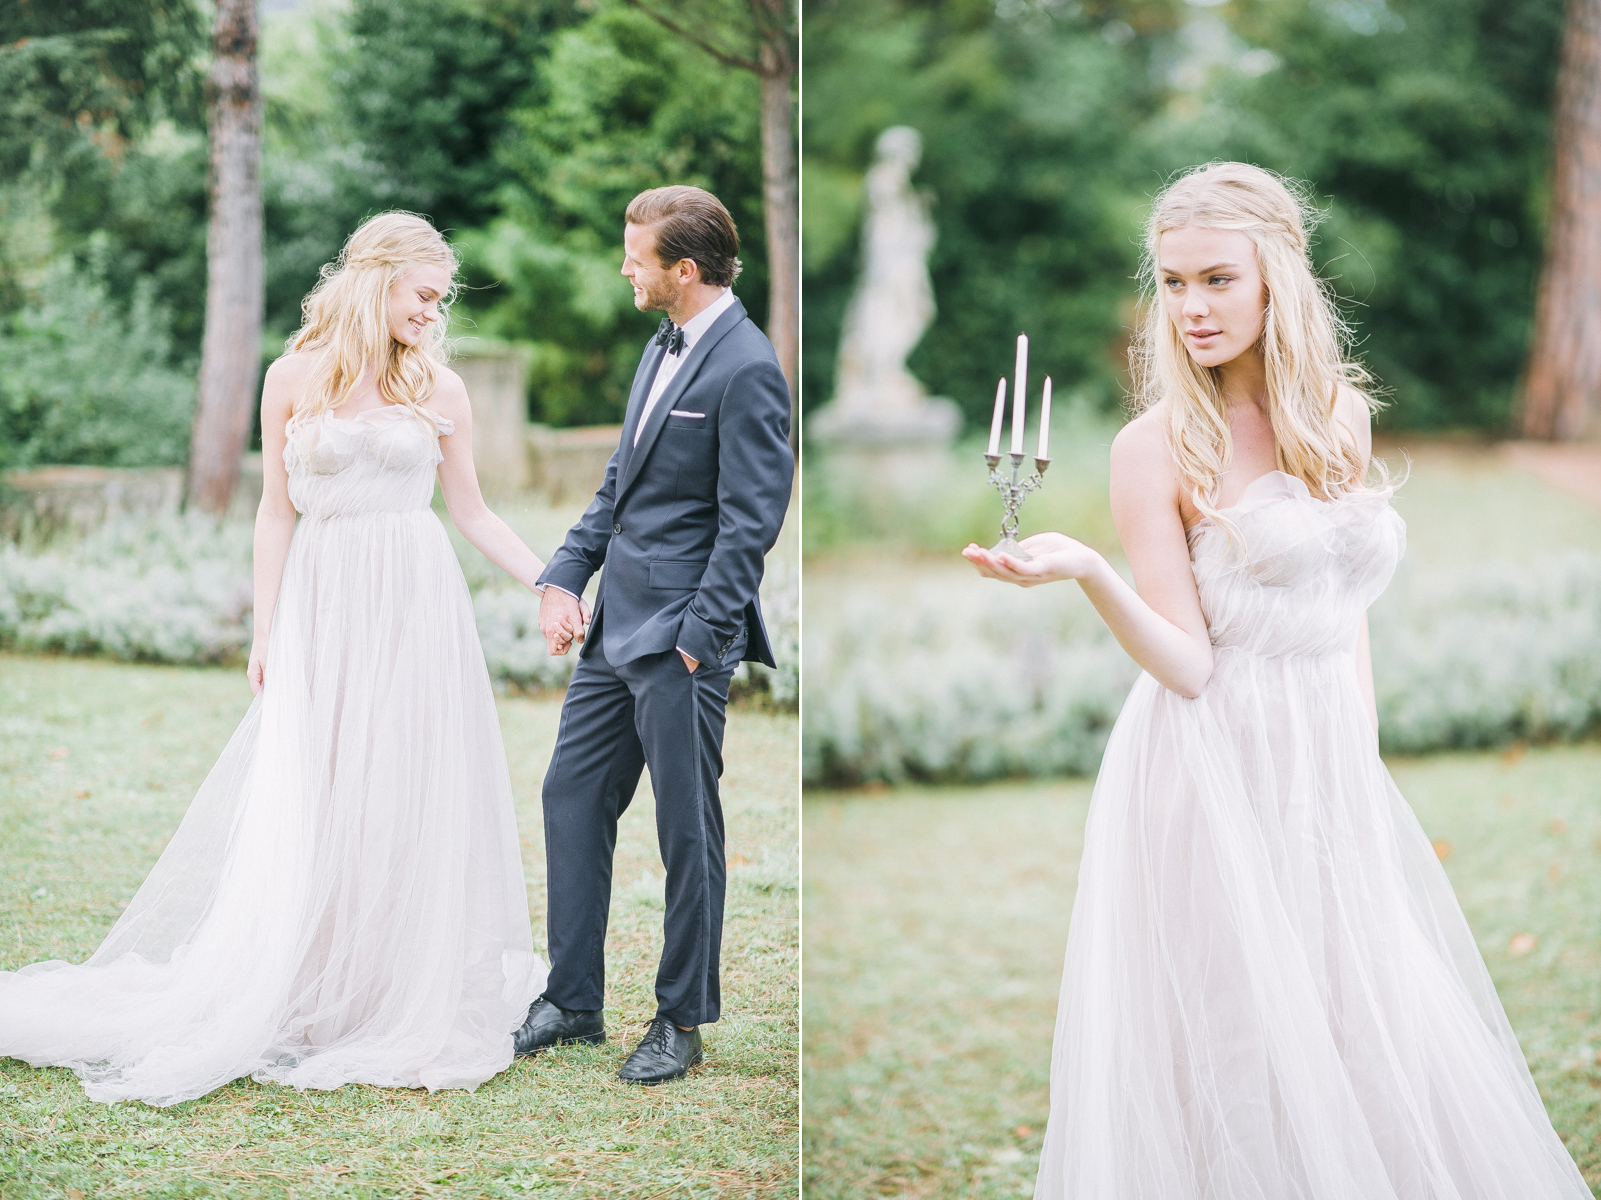 Boheme-Moon-wedding-photography-ravello-italy_16.jpg